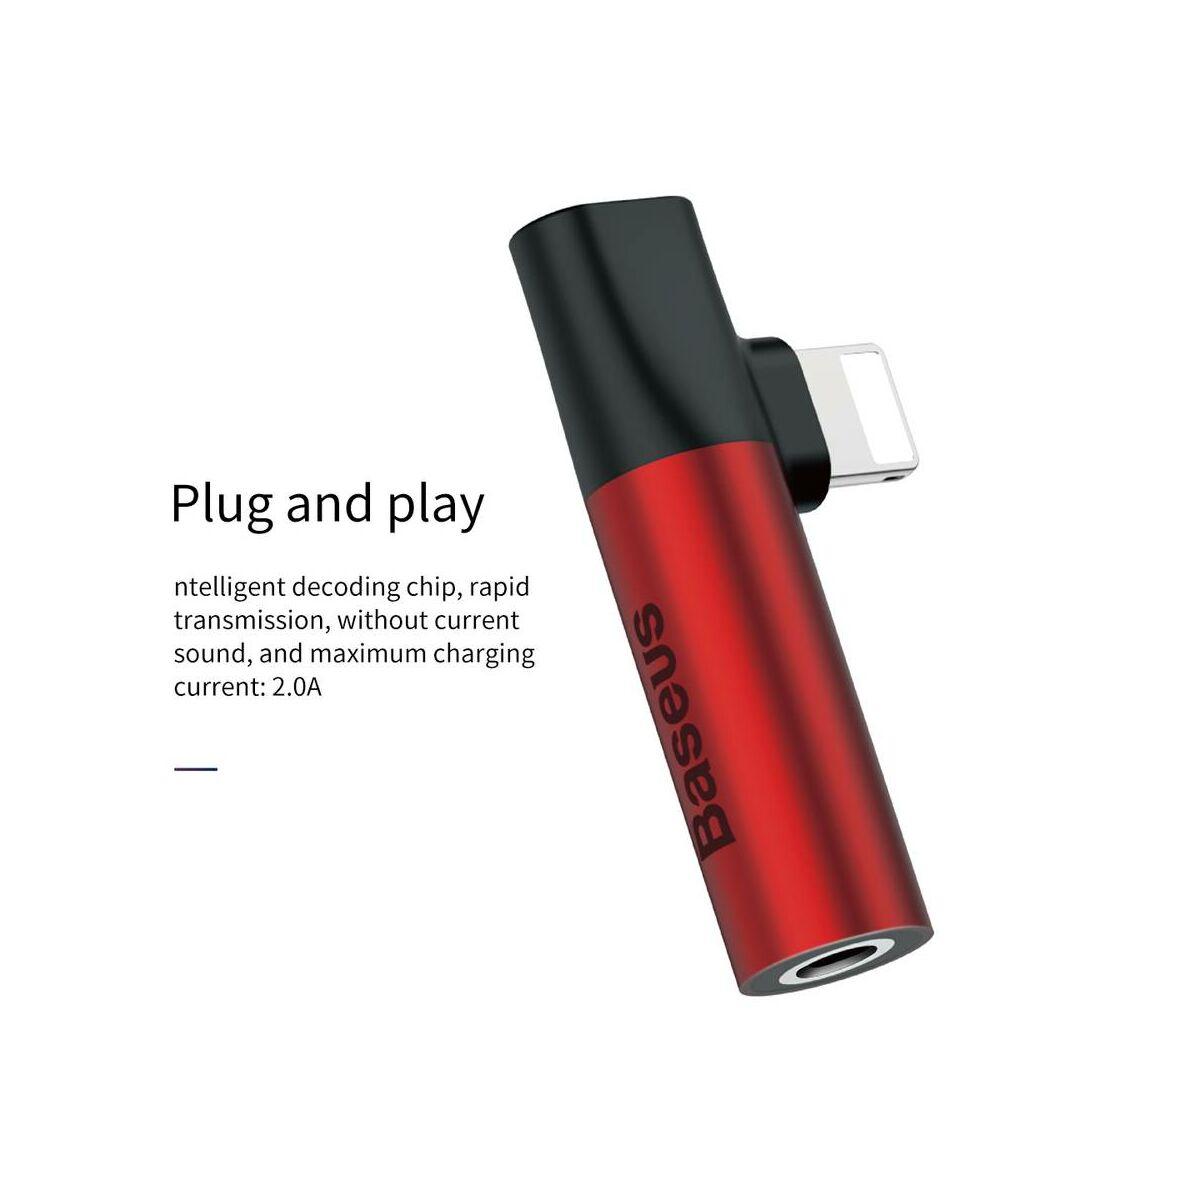 Baseus átalakító, L43 Lightning - Lightning + 3.5 mm, Jack audio, piros/fekete (CALL43-91)